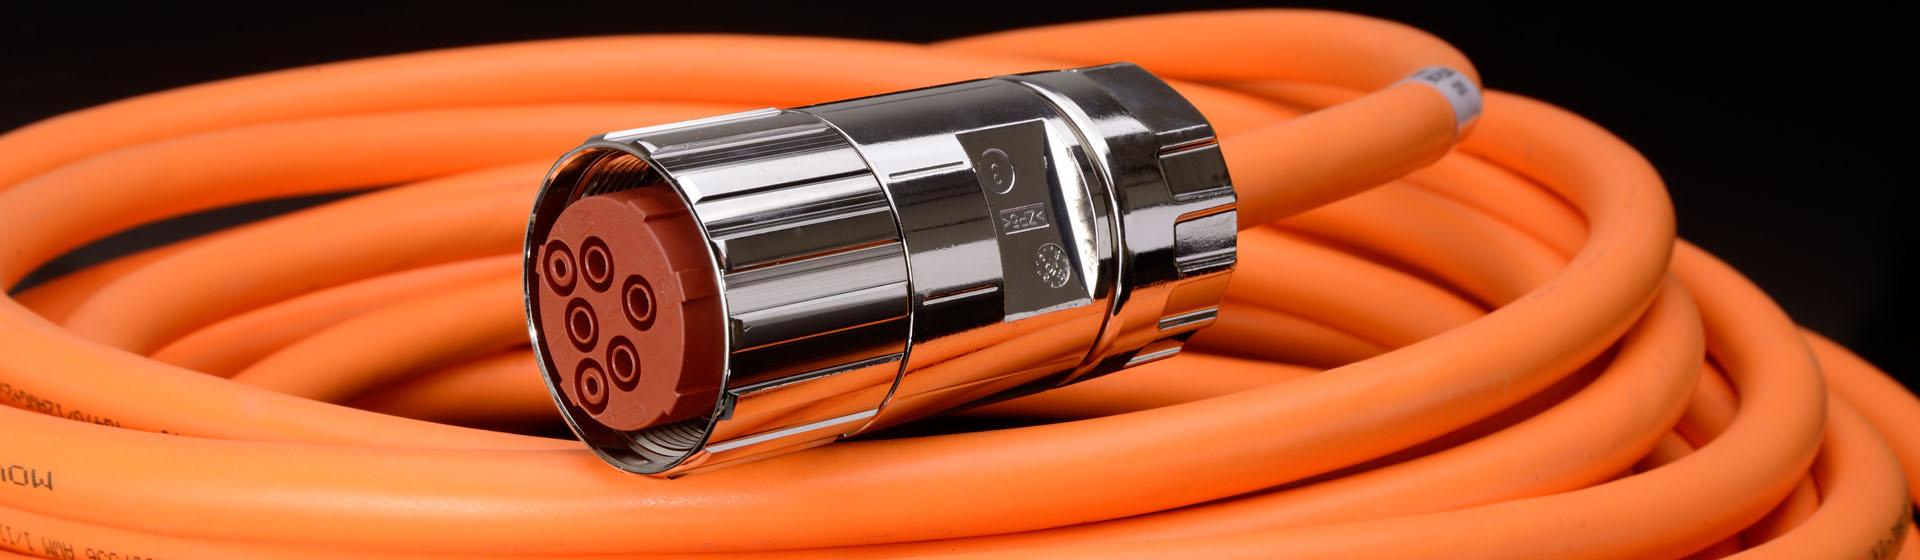 BNC-Elbis-slide_0006_cavo-automazione-arancio